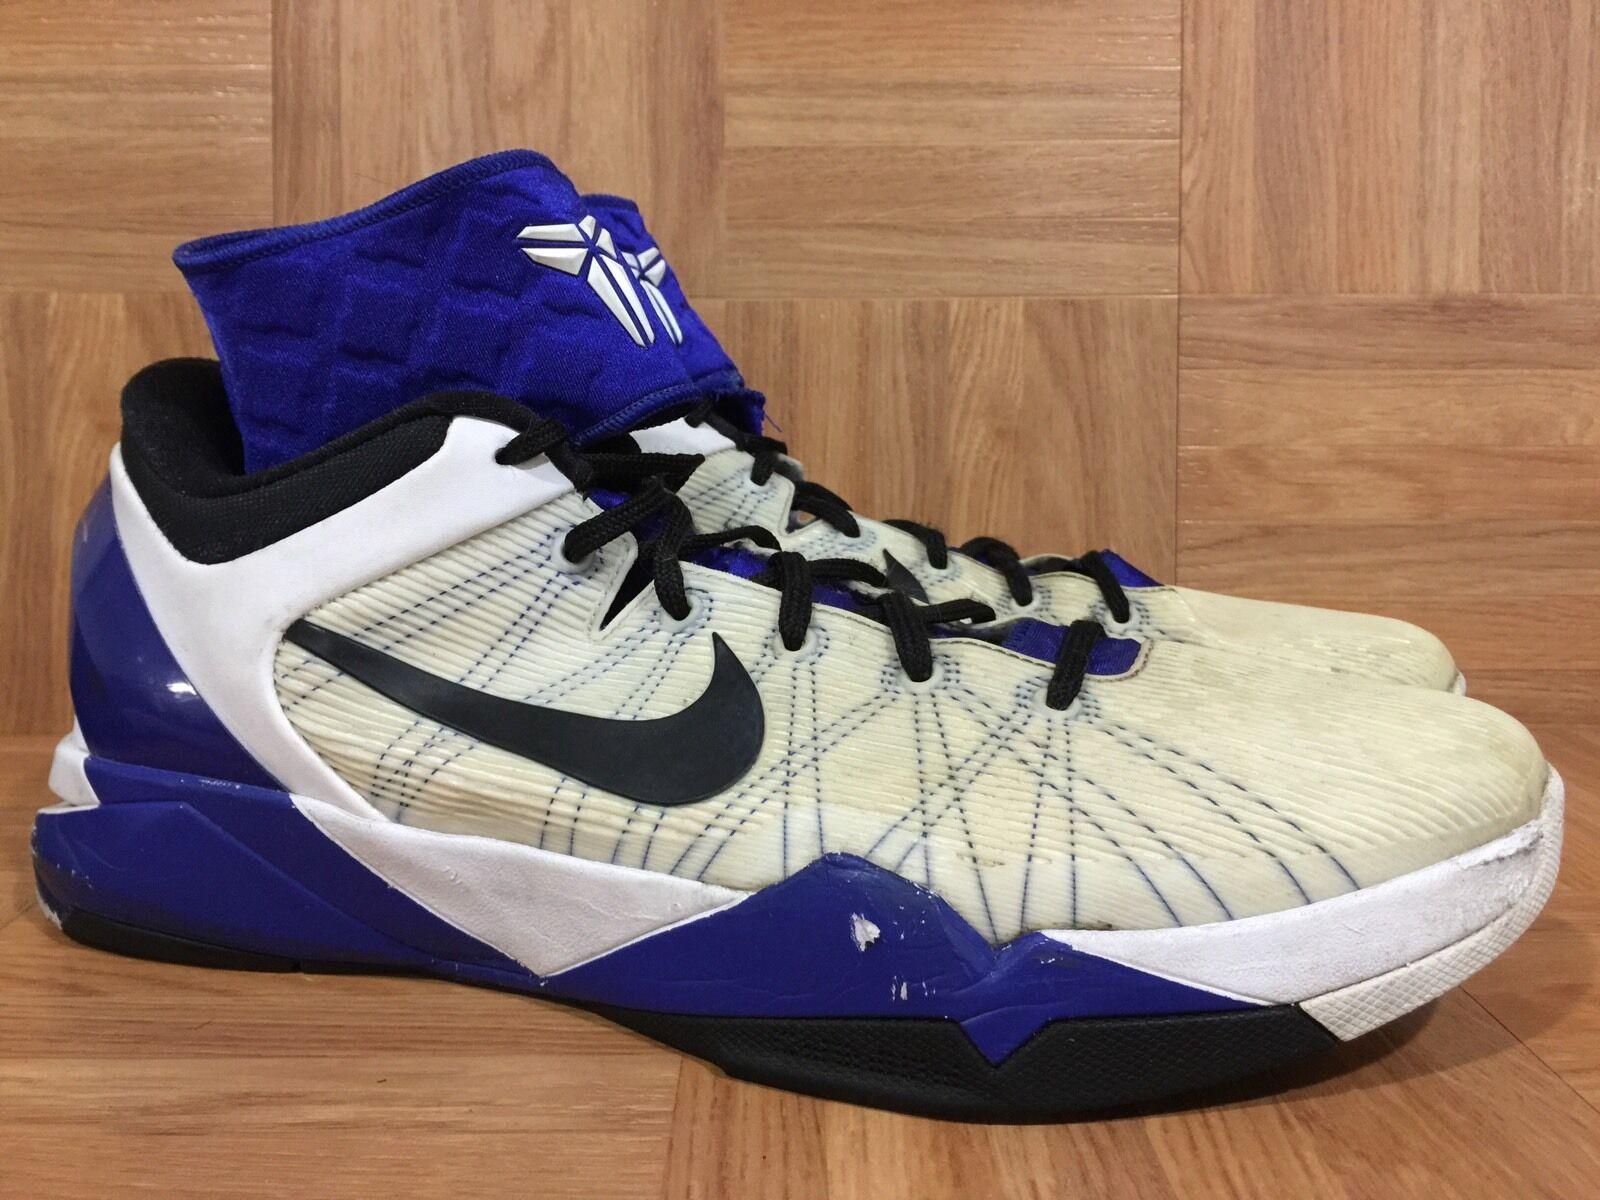 RARE  Nike Zoom Kobe 7 488244-100 VII System 488244-100 7 Purple Concord Black White Size 13 4908dc